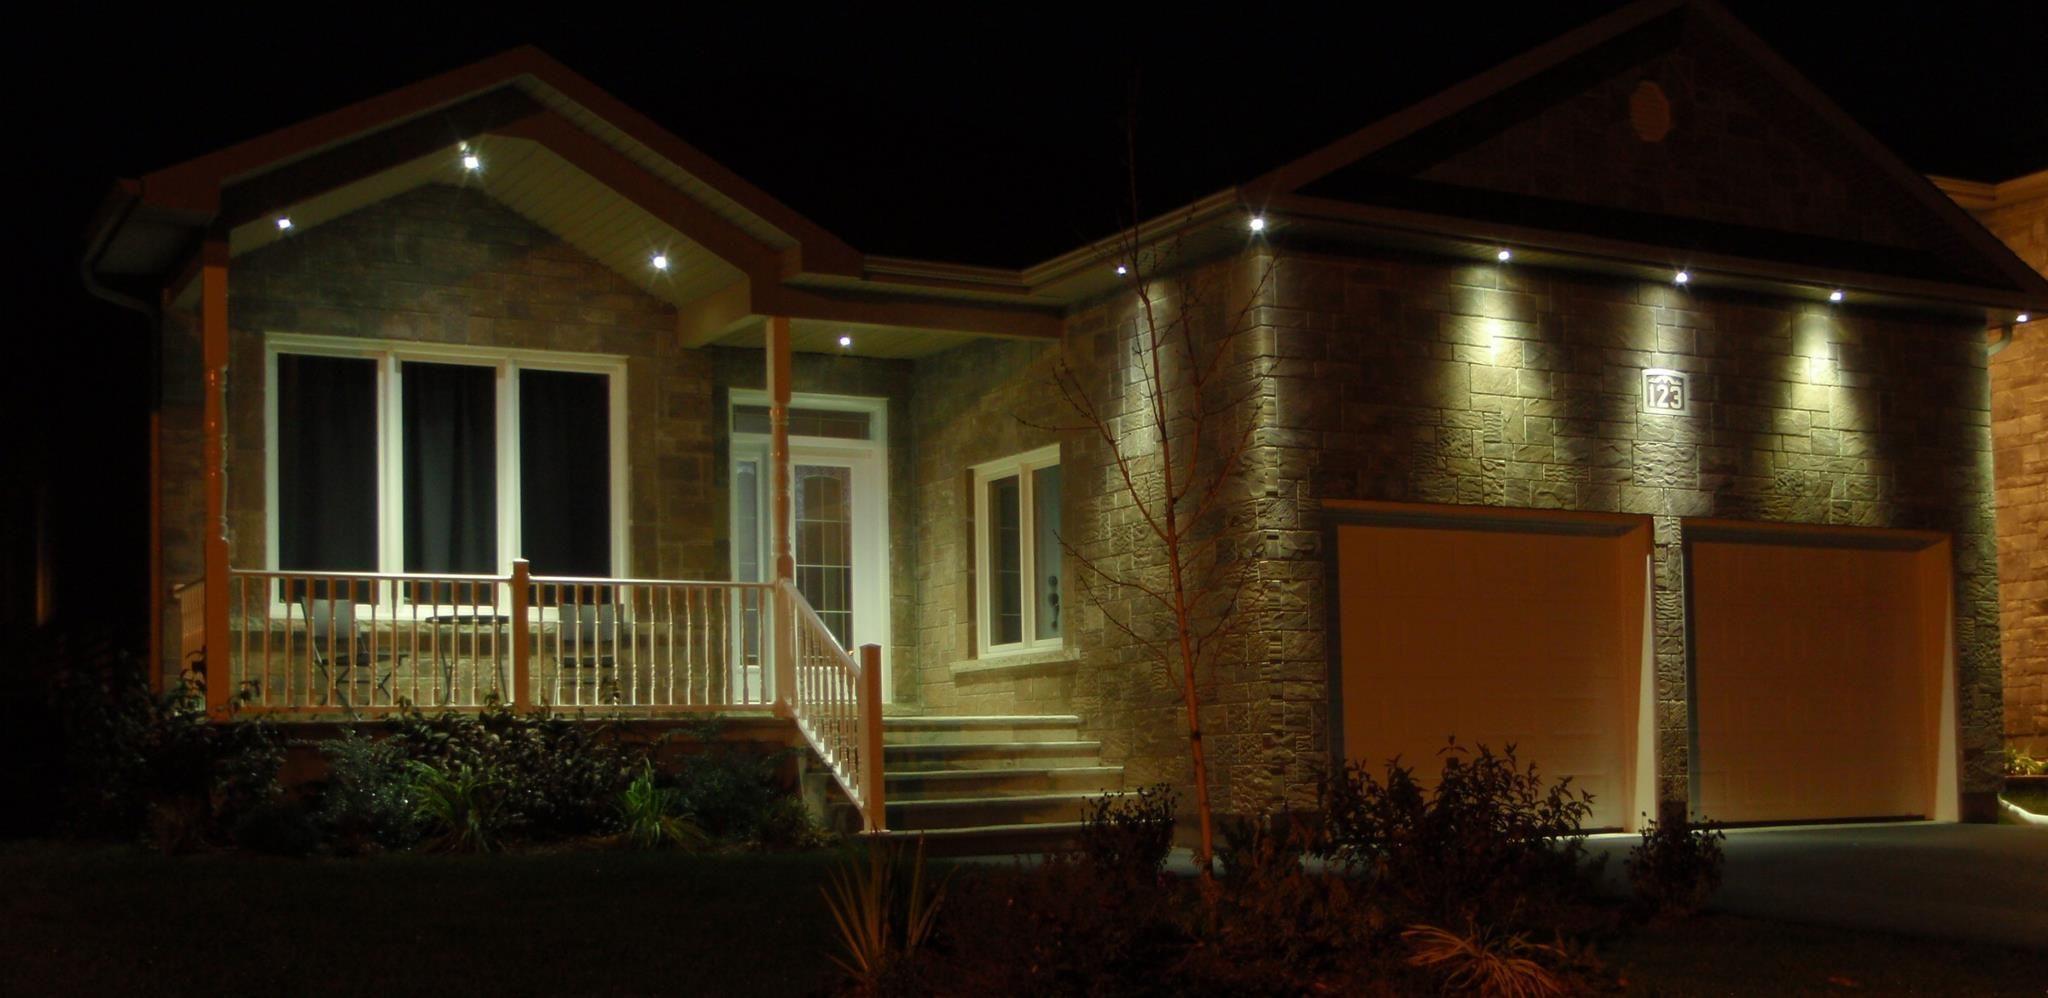 Delphitech Led Outdoor Lighting Better Exterior Home Designs